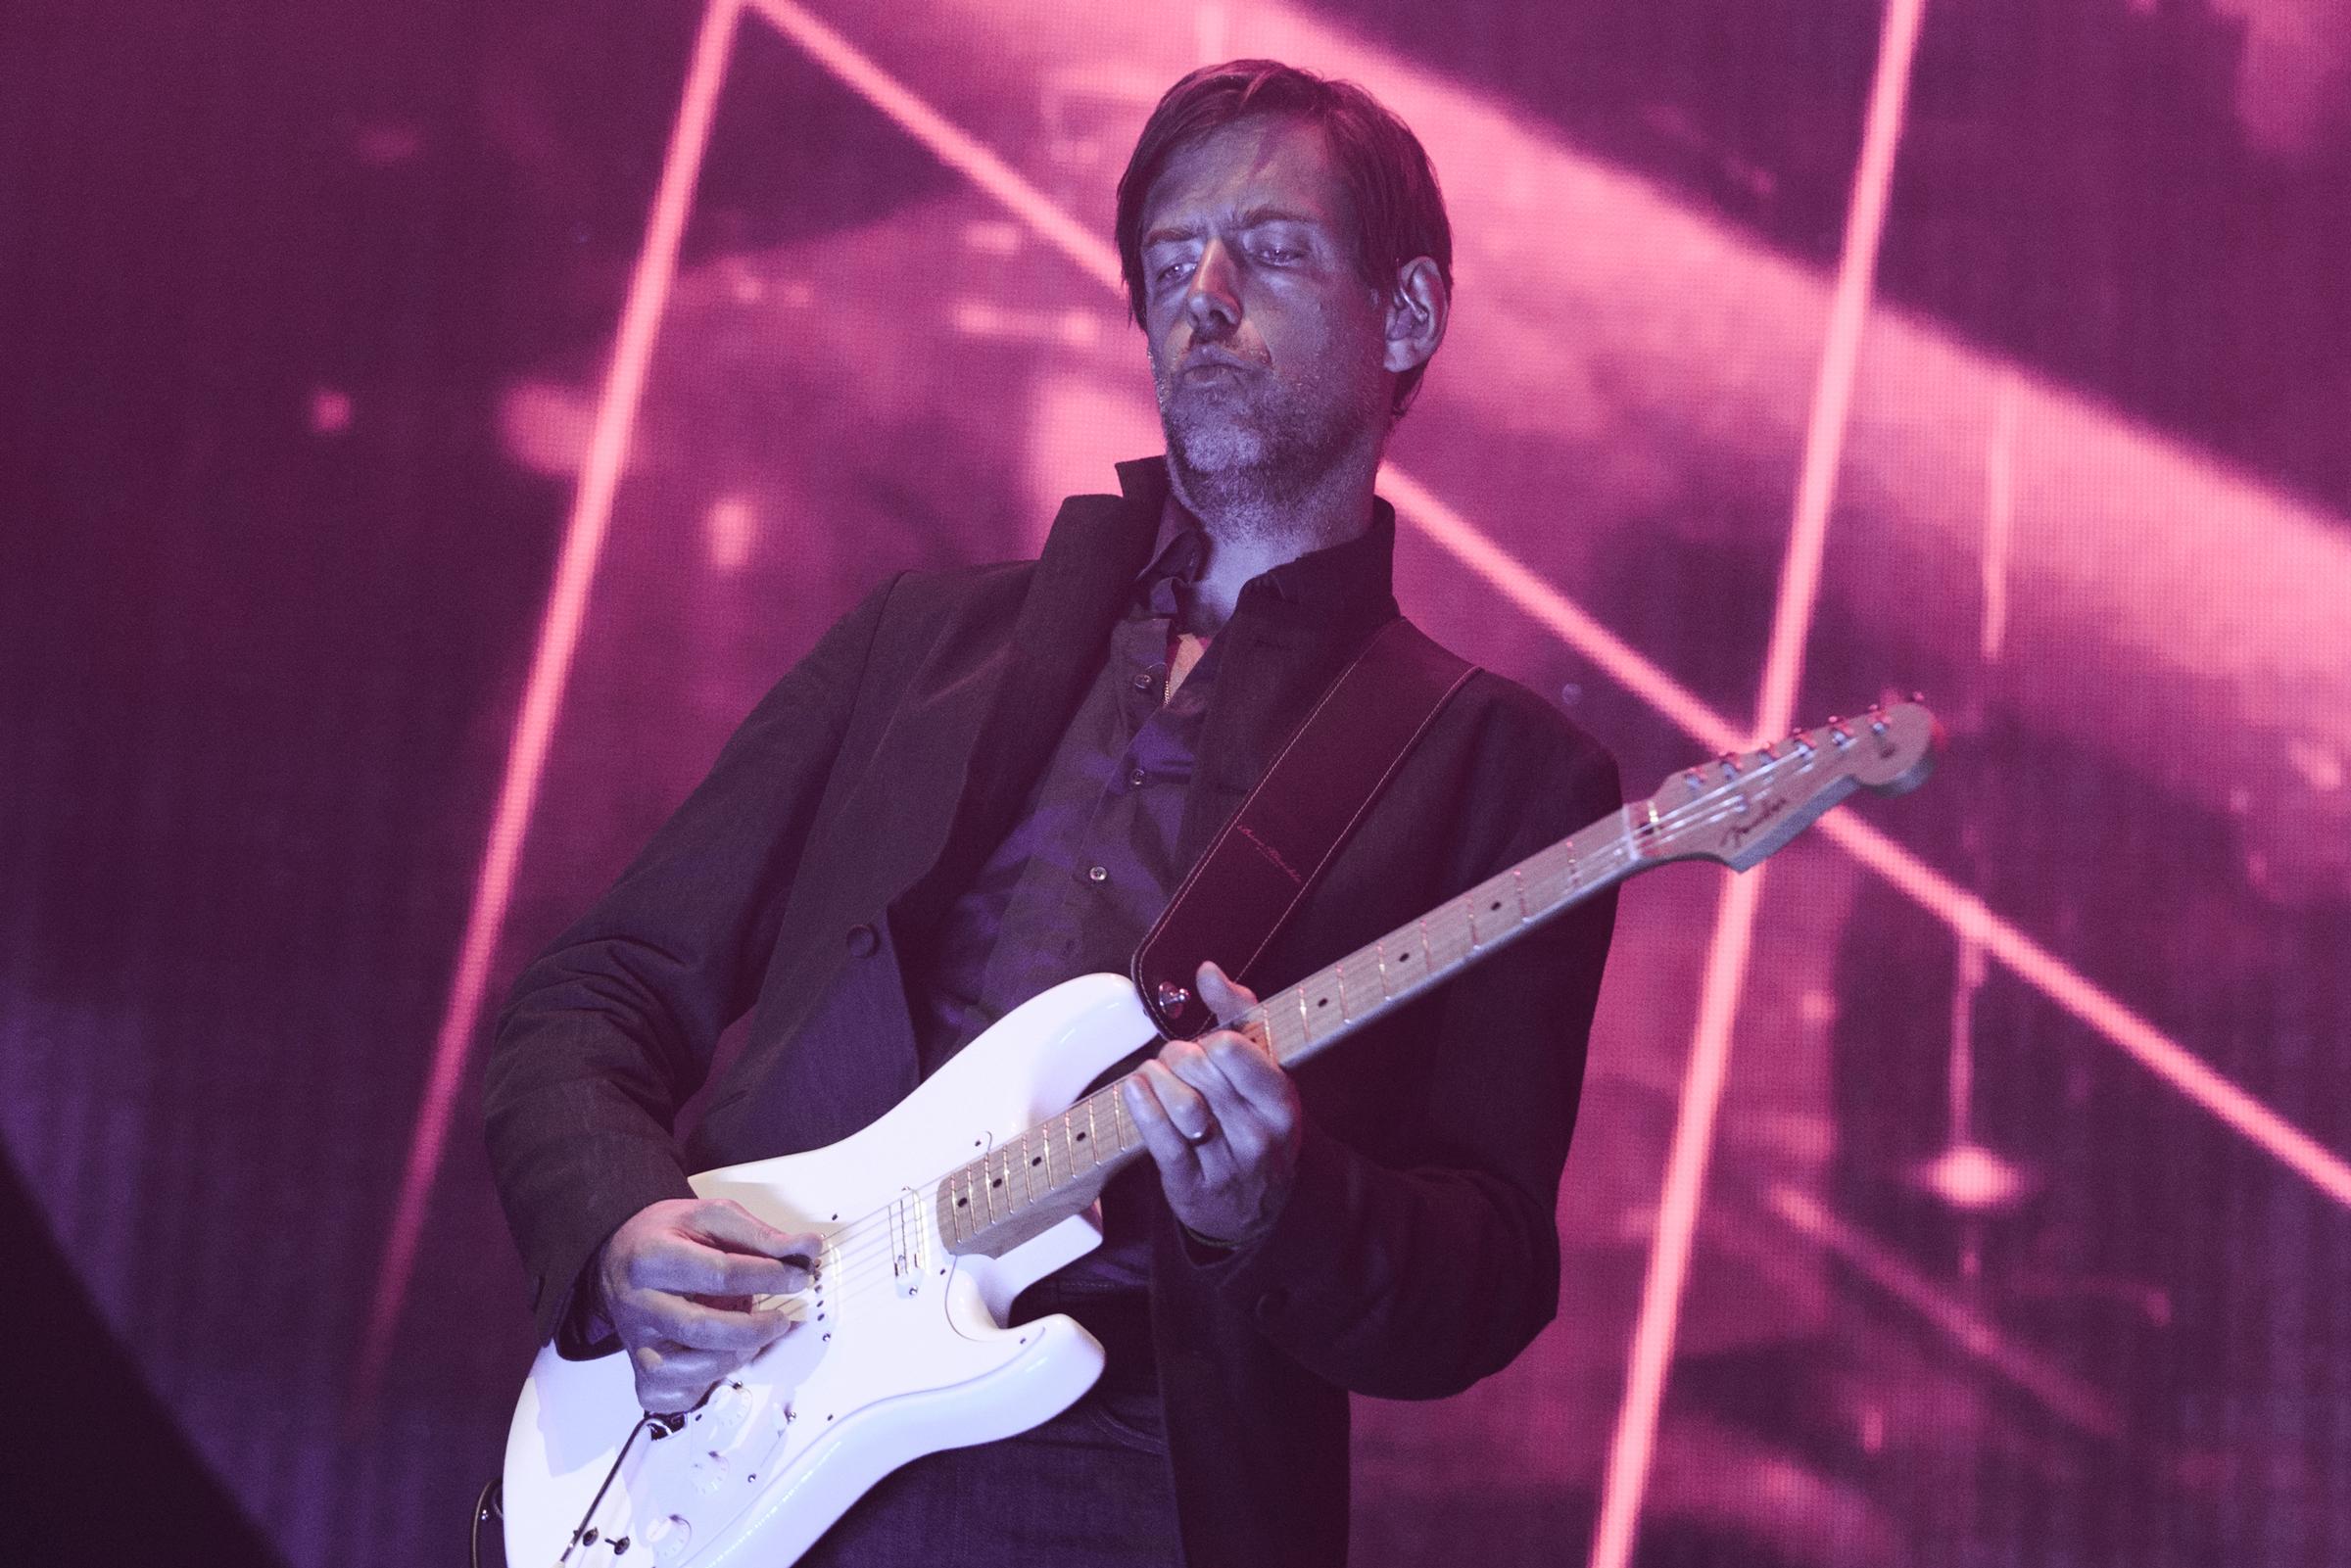 Radiohead's Ed O'Brien Announces First North American Tour